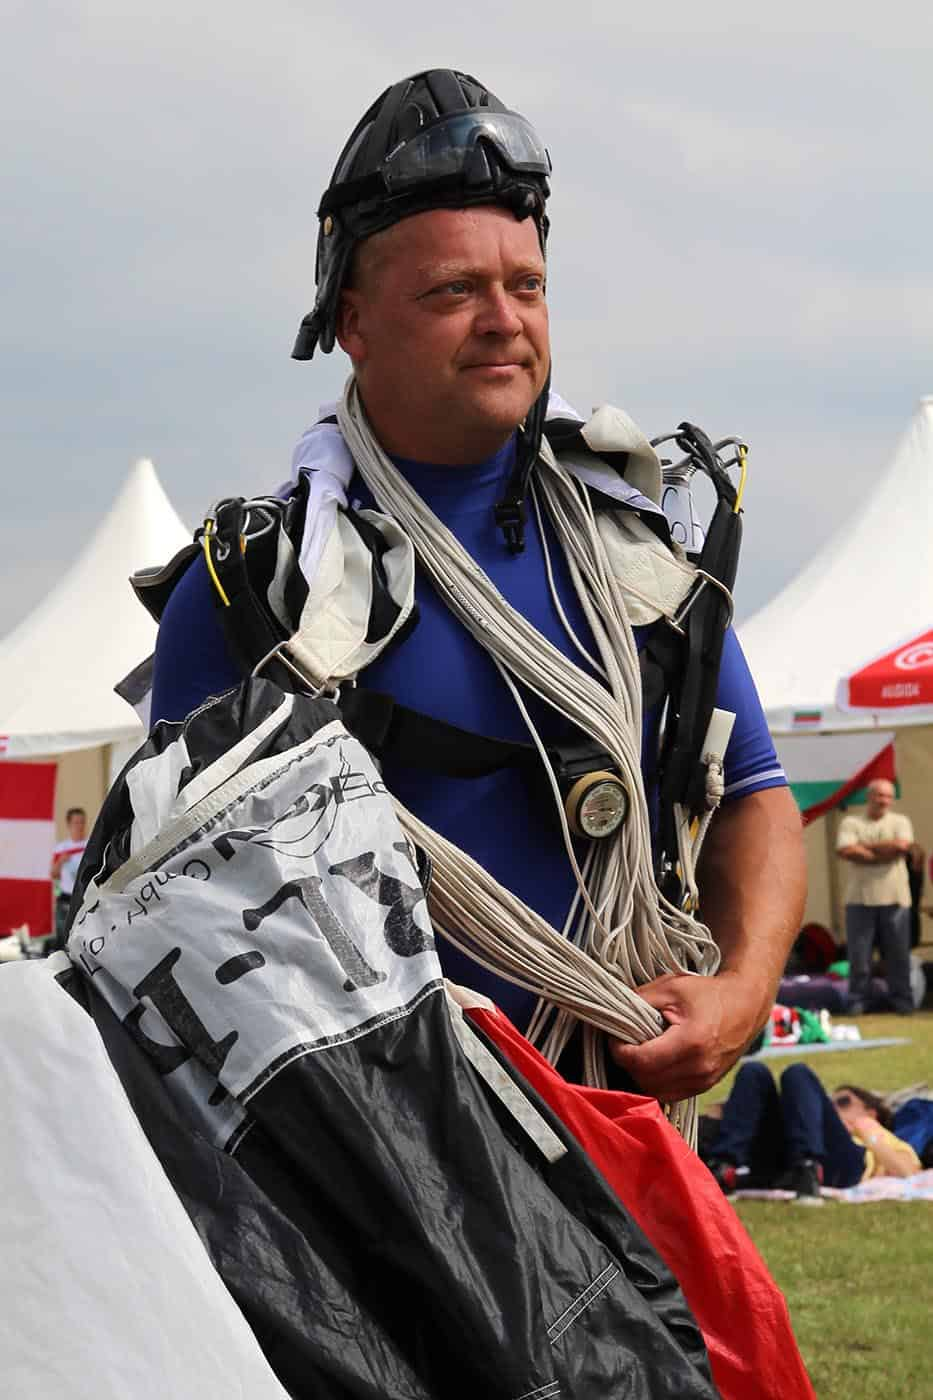 Marco Plüger